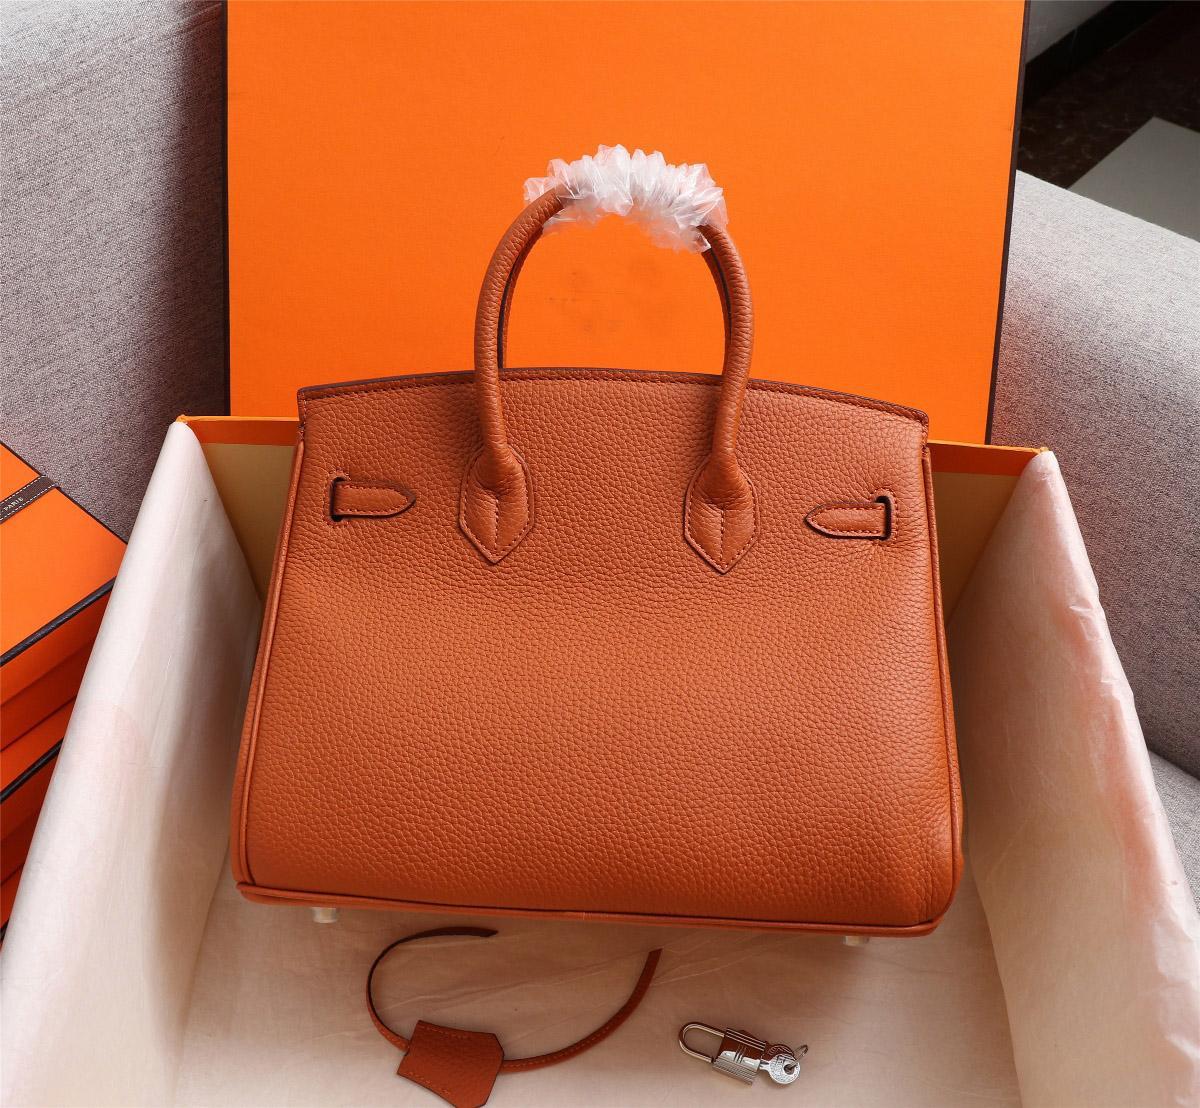 Luxurys designers bolsas bolsas bolsas de moda genuíno 2021 ombro crossbody fácil para combinar mostrando charme